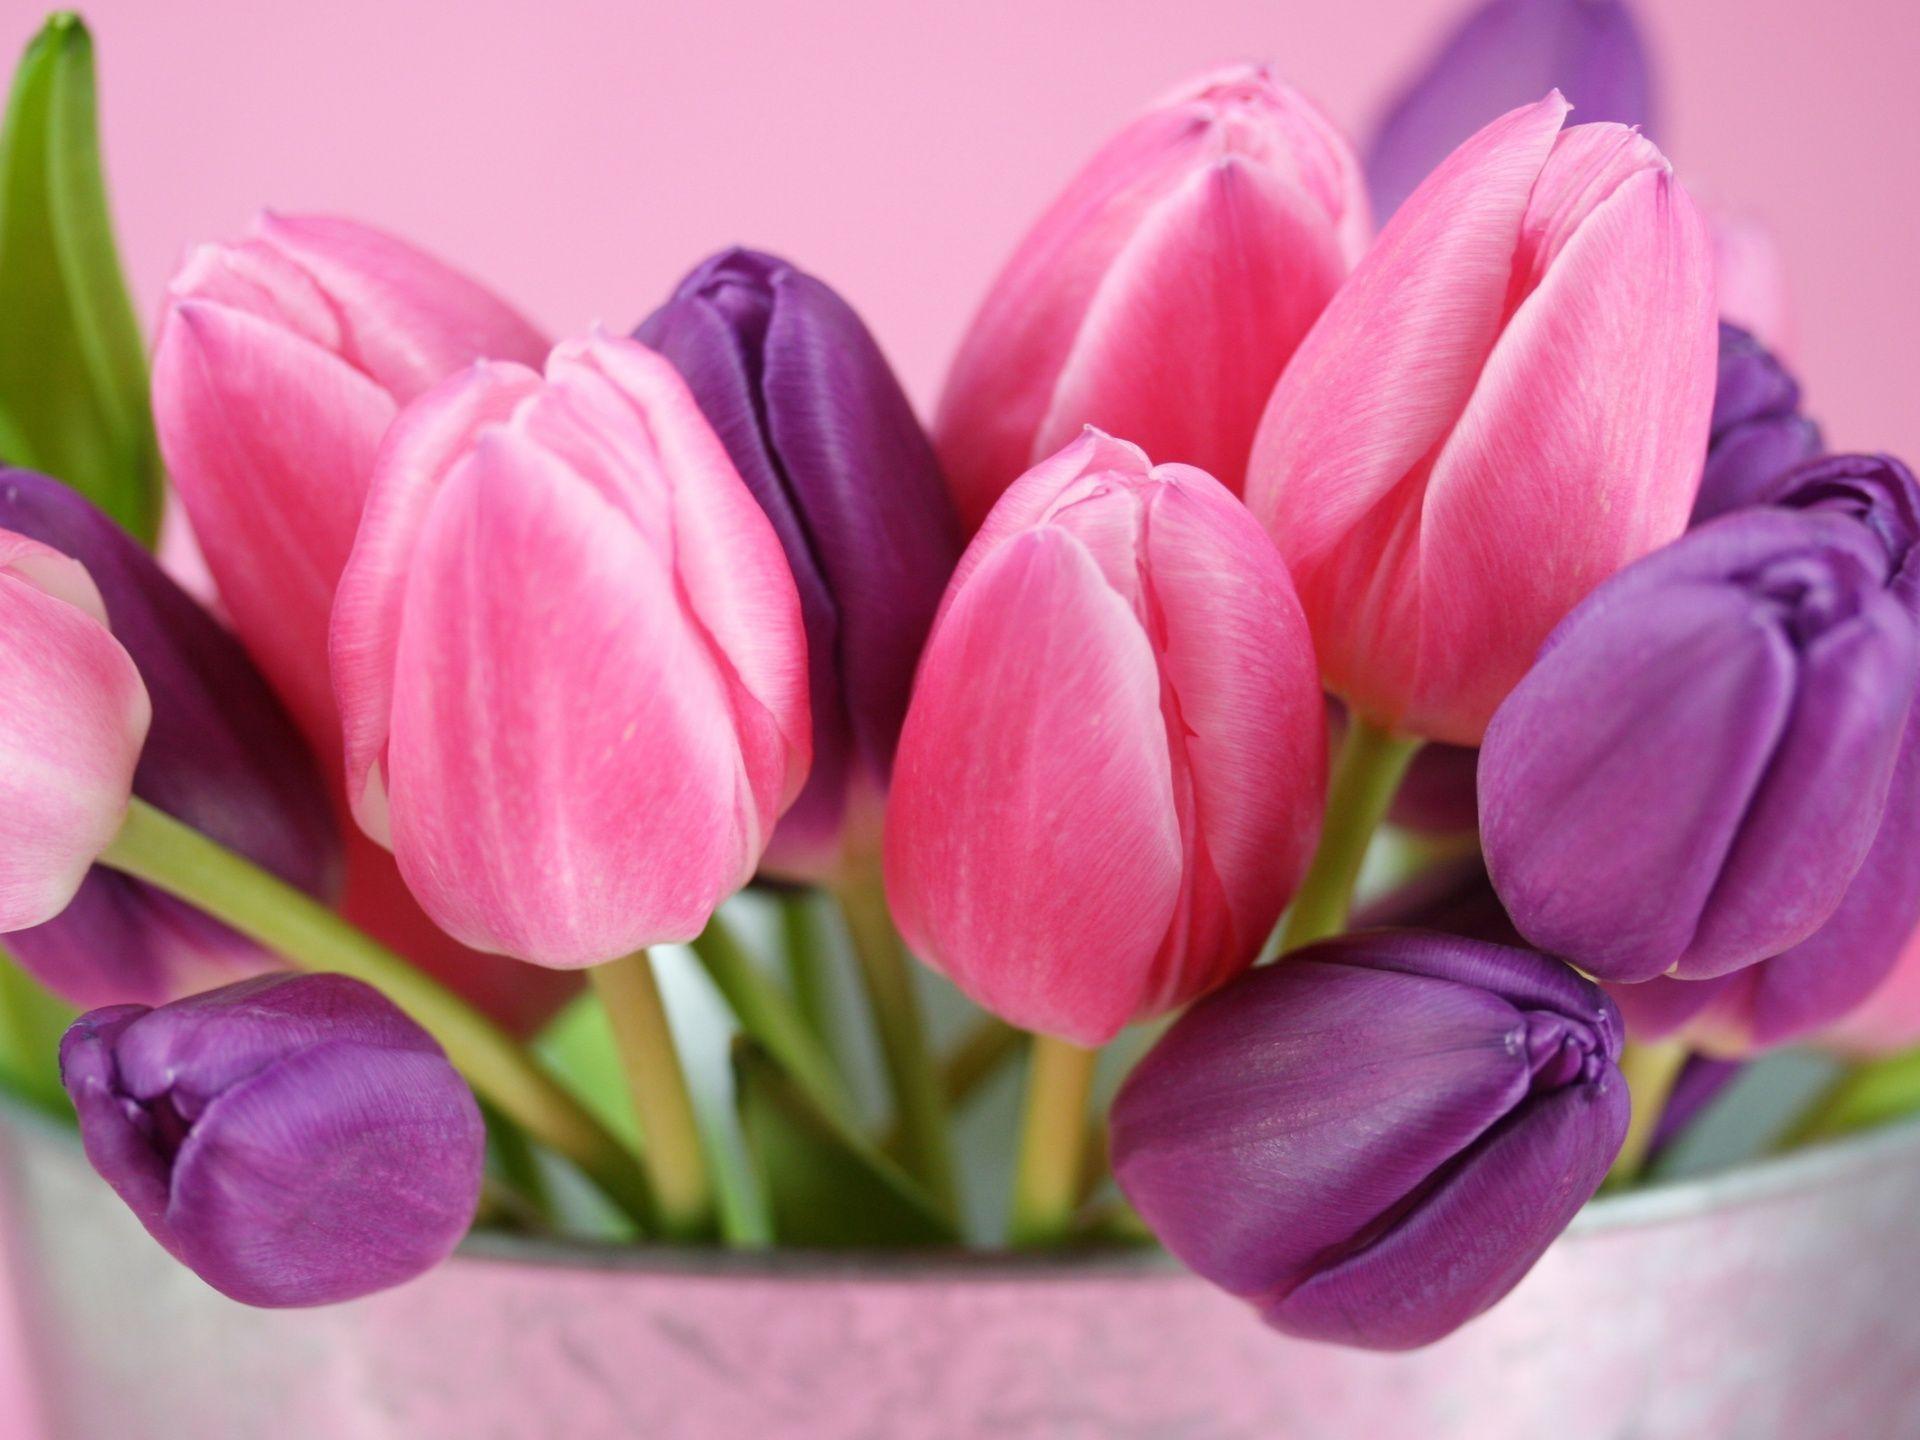 Pink Tulips HD Wallpaper